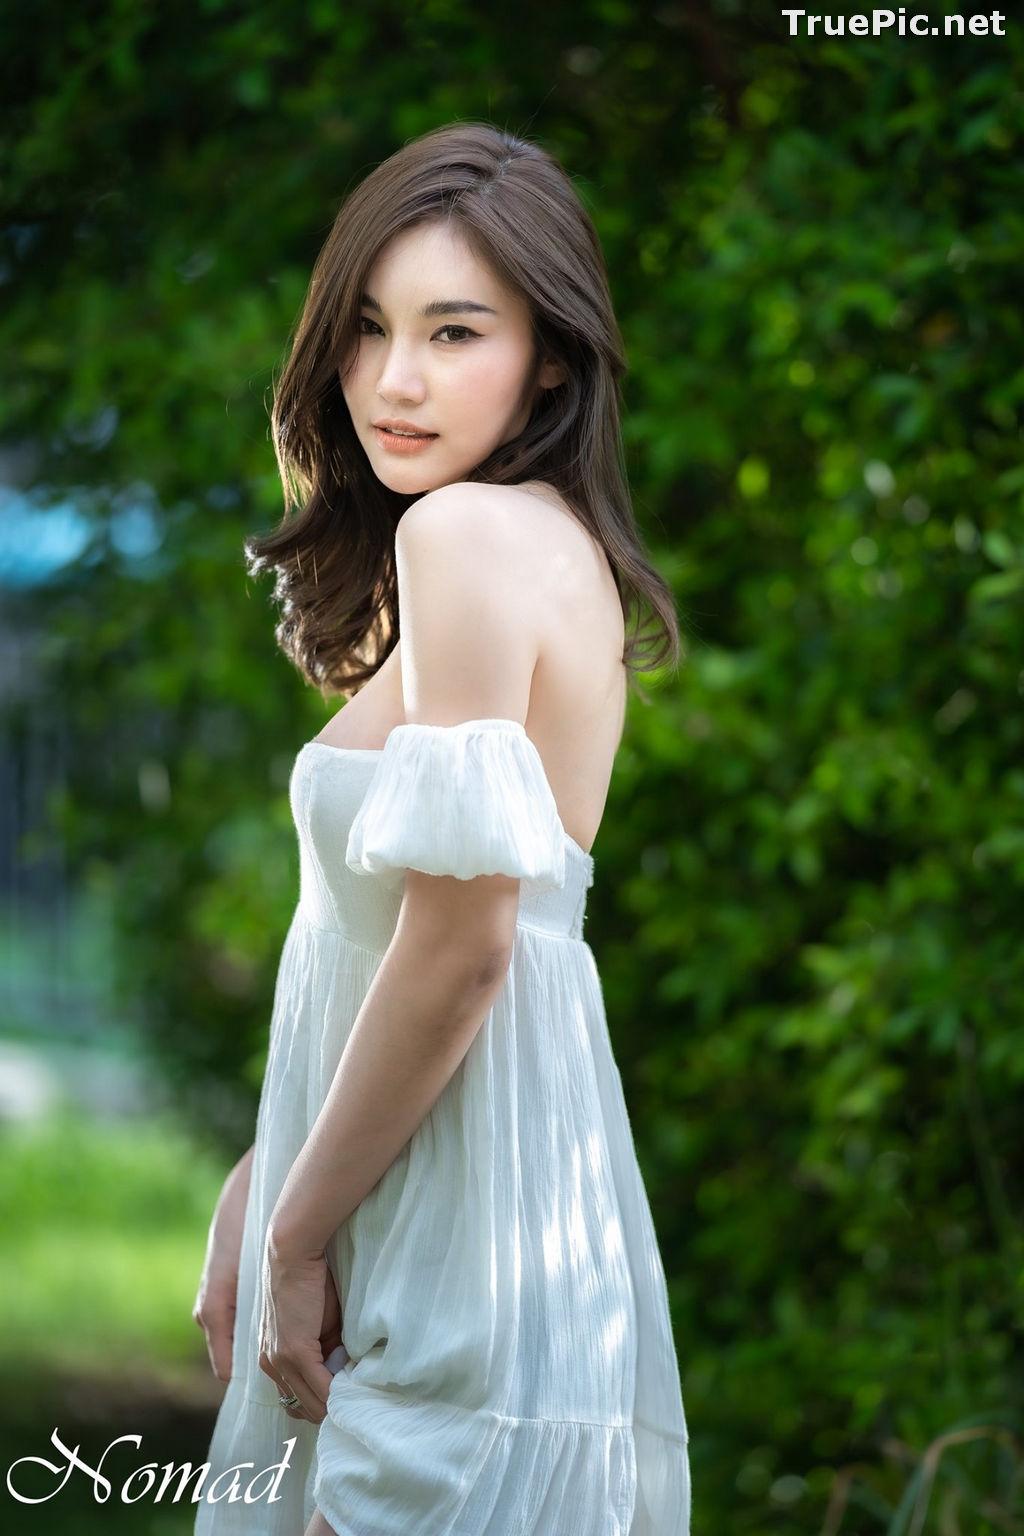 Image Thailand Model - Jarunan Tavepanya - Beautiful In Black and White - TruePic.net - Picture-4